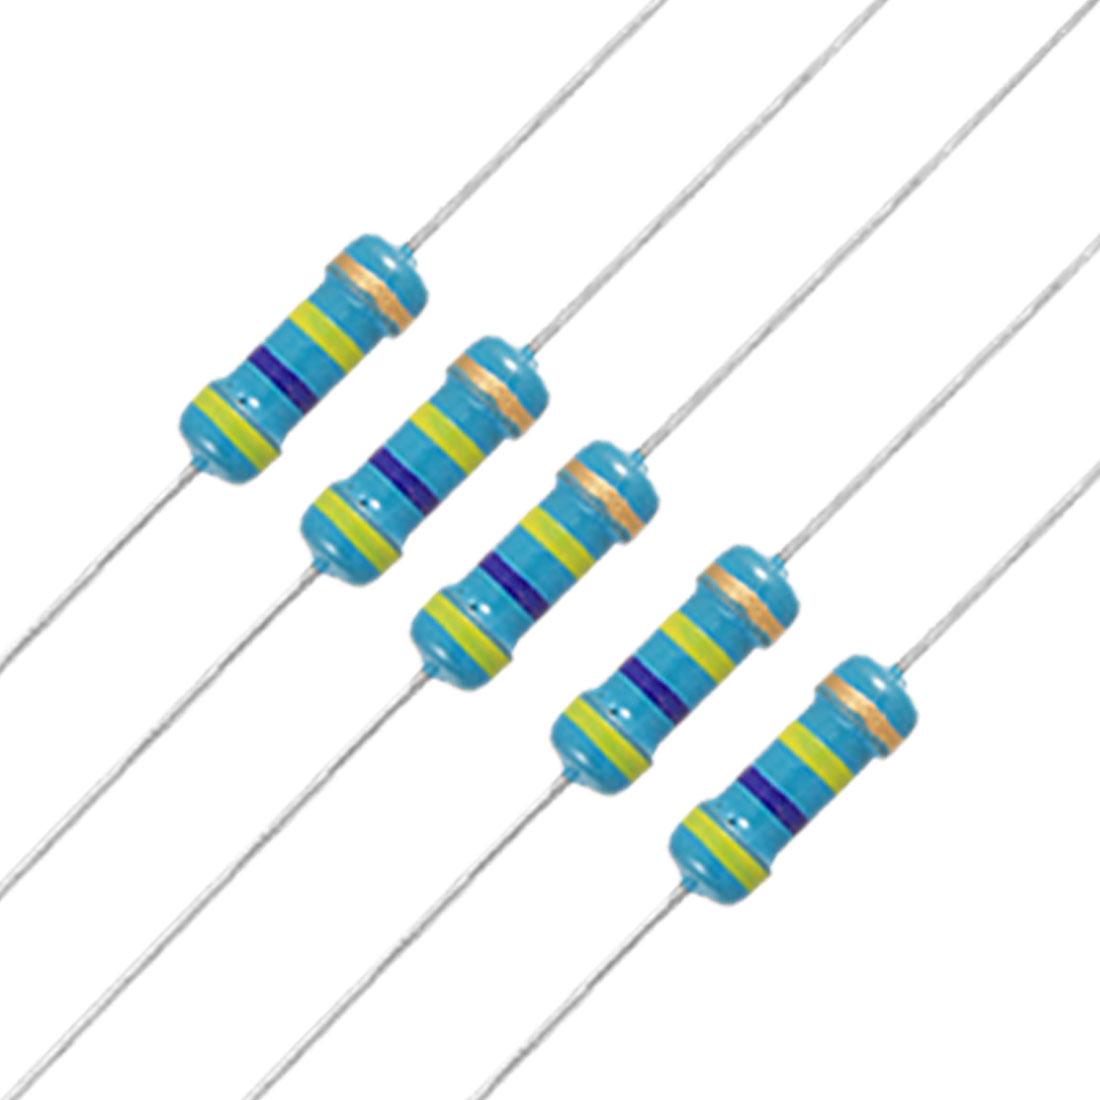 20 x 1/2W Watt 470K ohm 470KR Carbon Film Resistor 0.5W